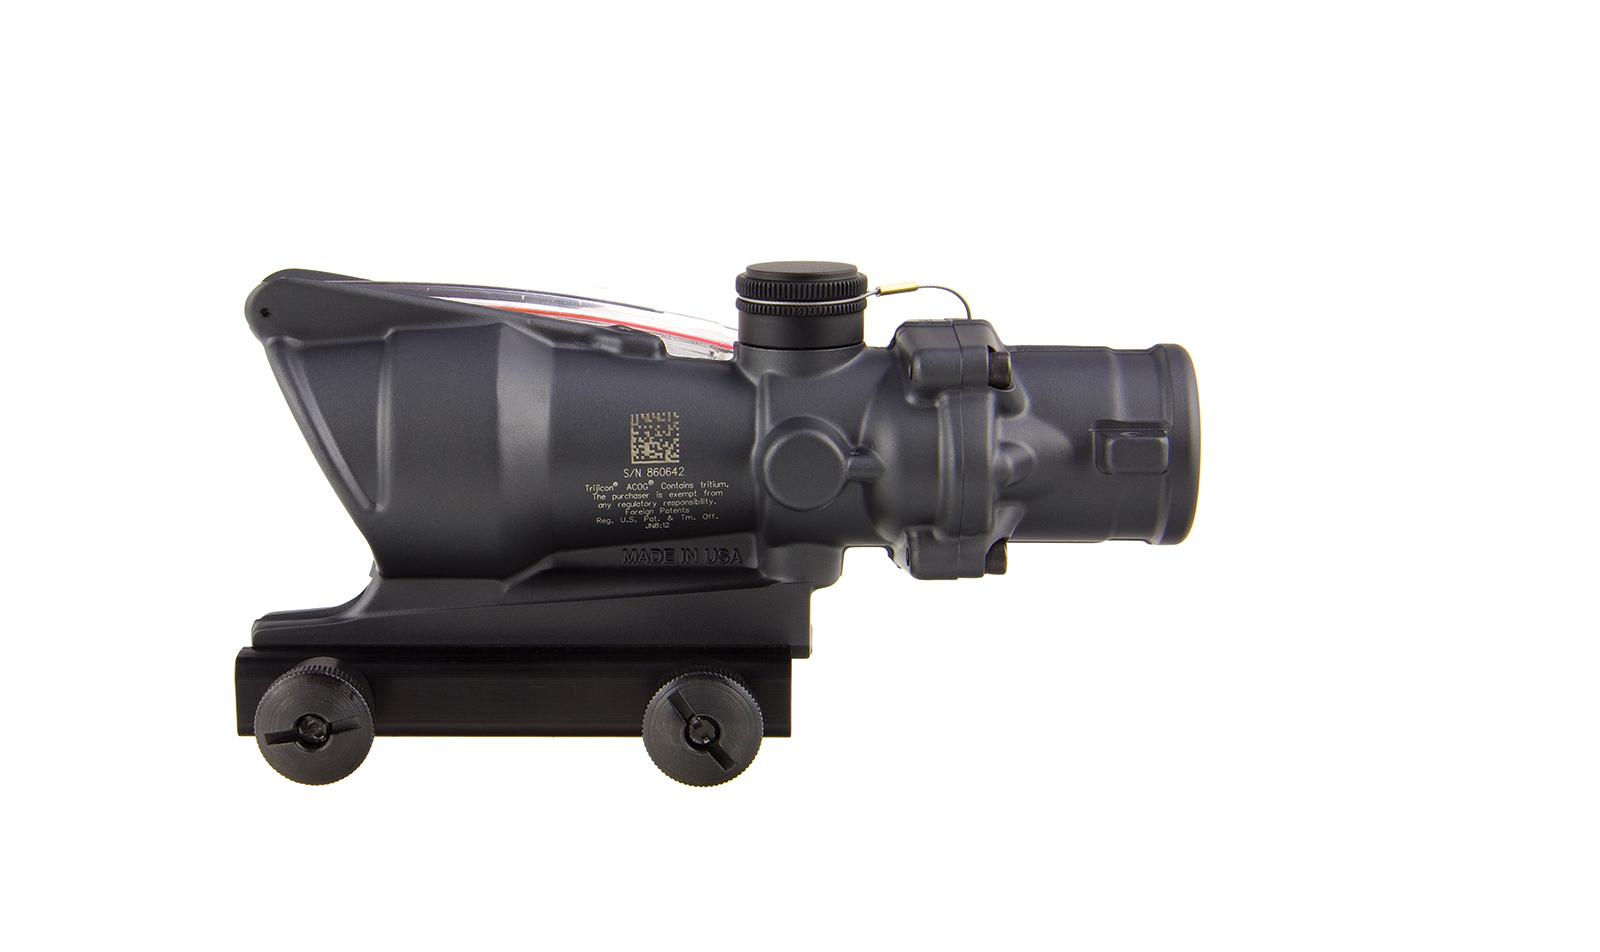 TA31-C-100370 angle 2